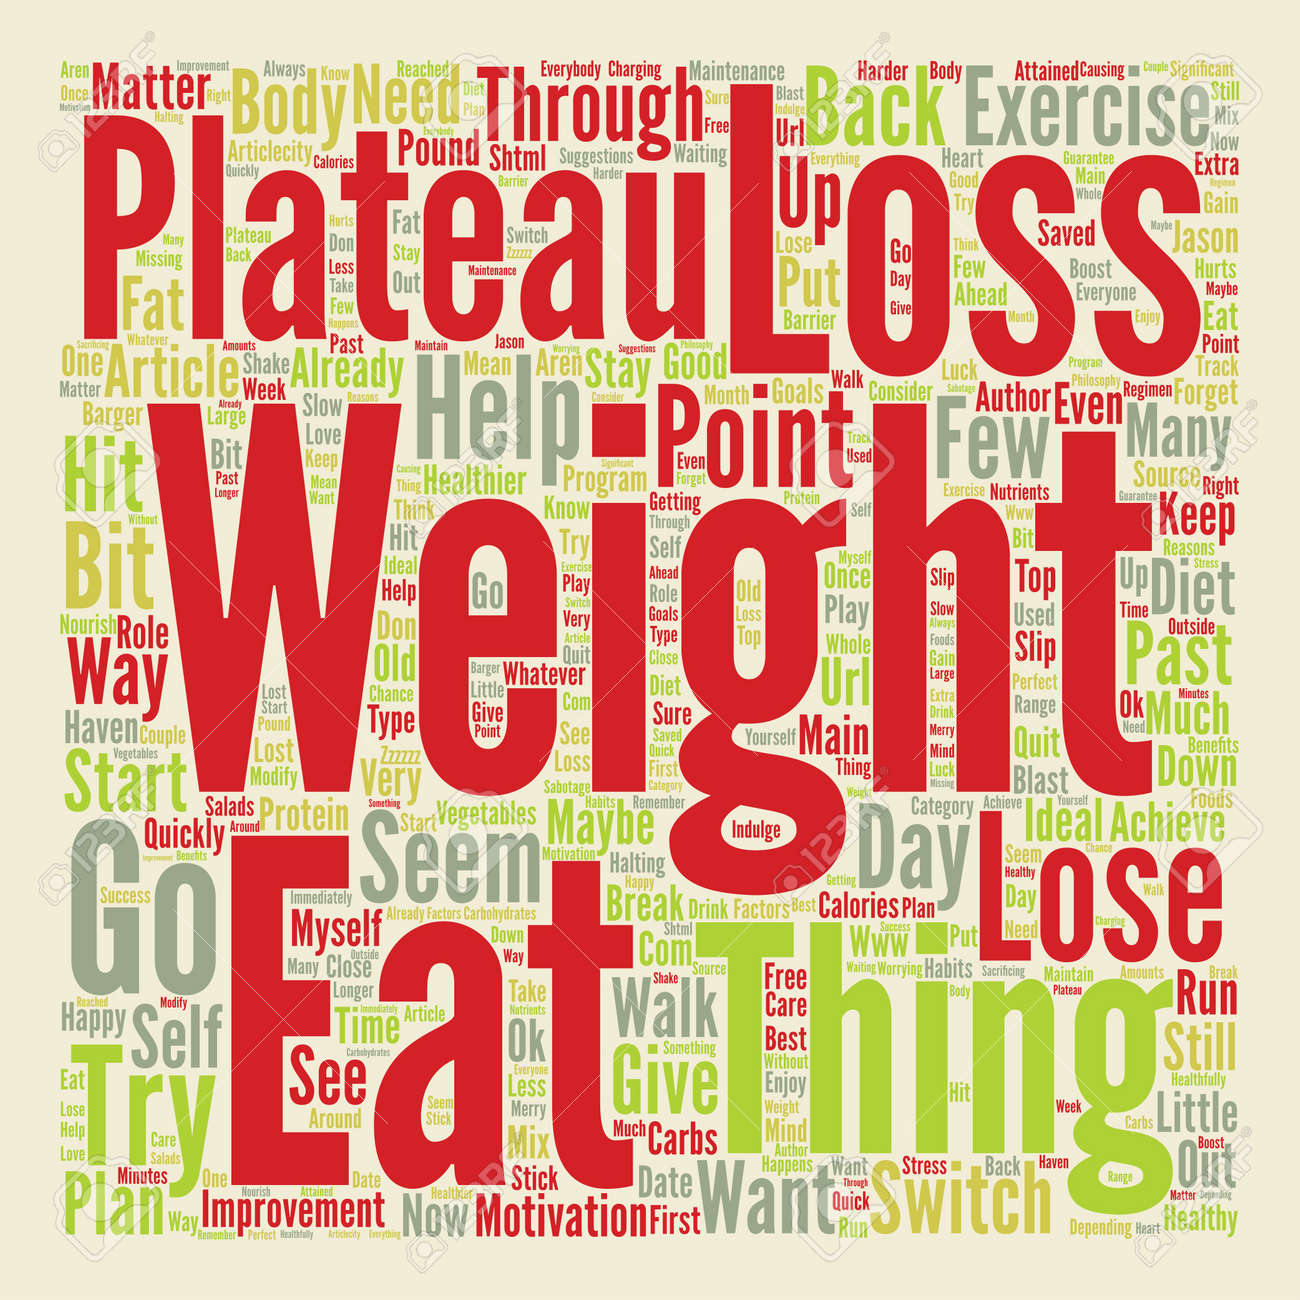 Free weight loss juicing recipes